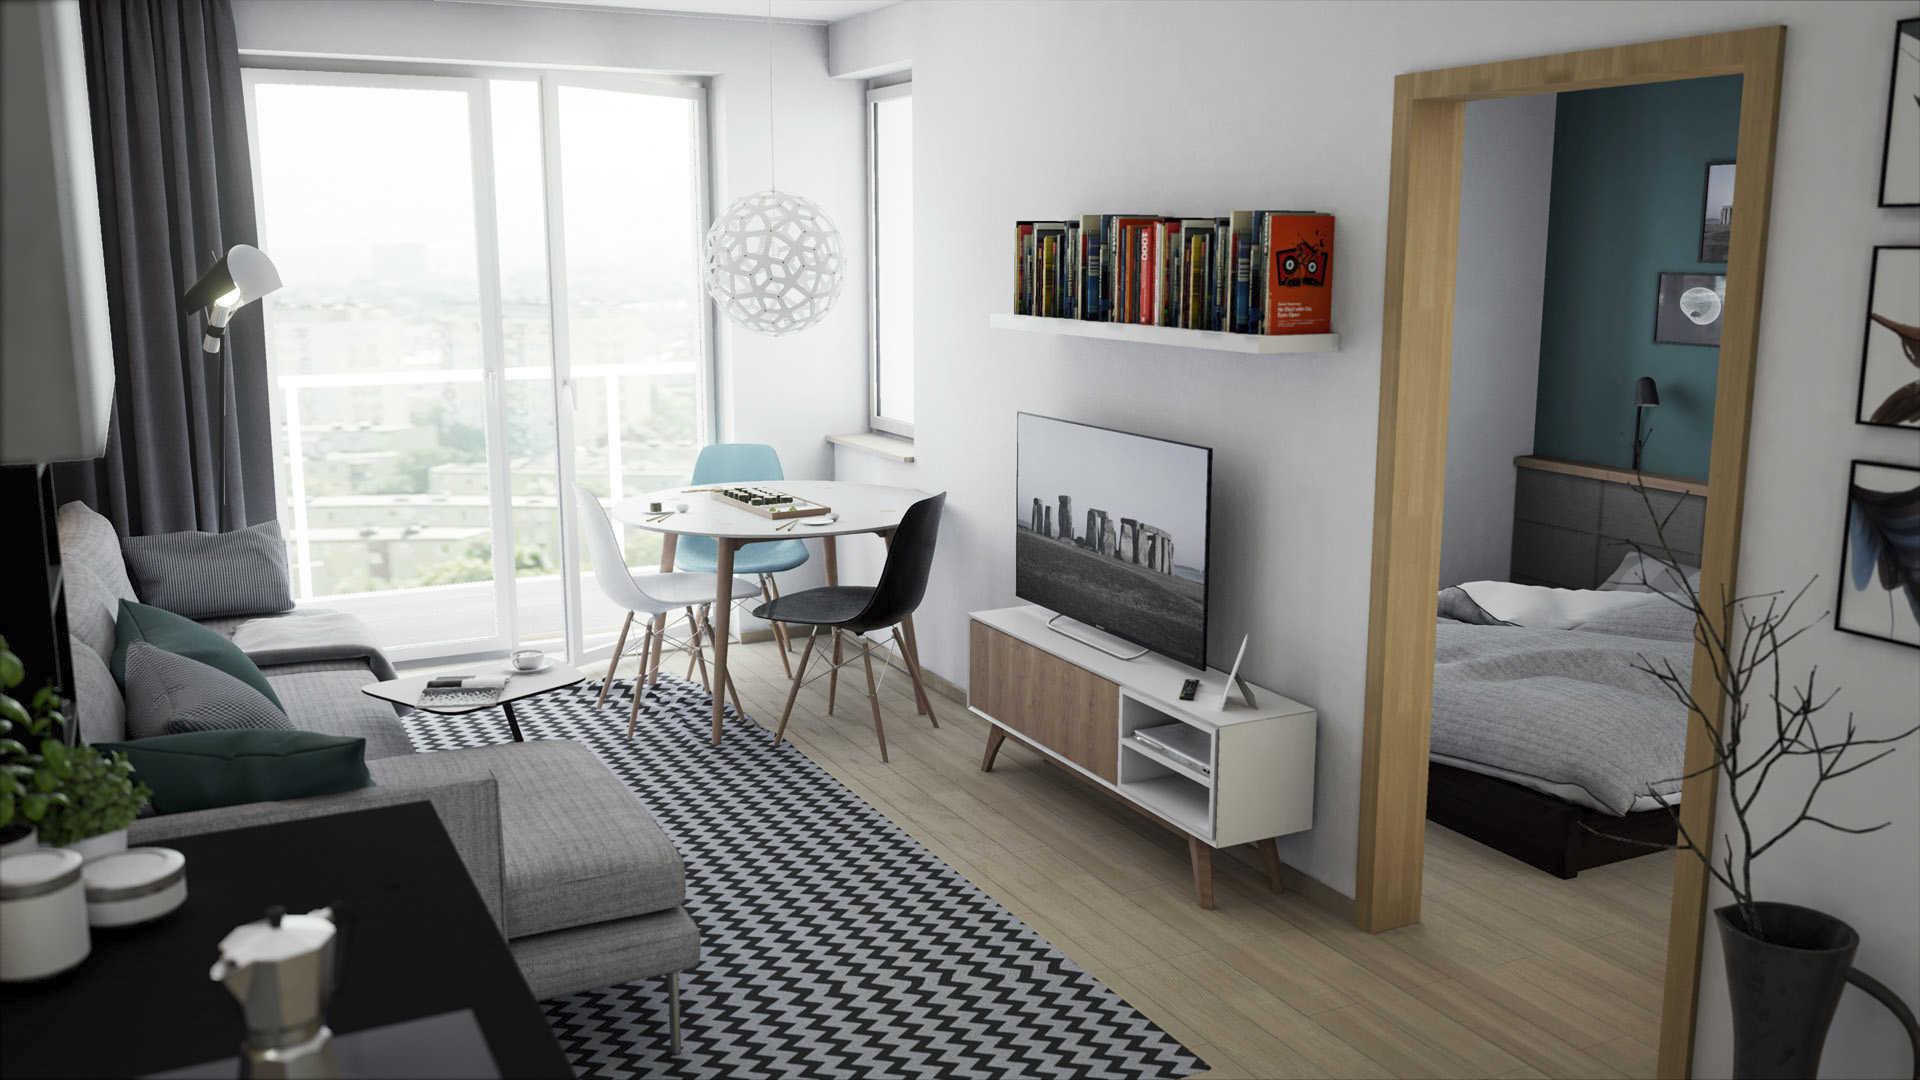 e49a3b48f53a82 Zakup mieszkania - o czym pamiętać? - DevelopRes